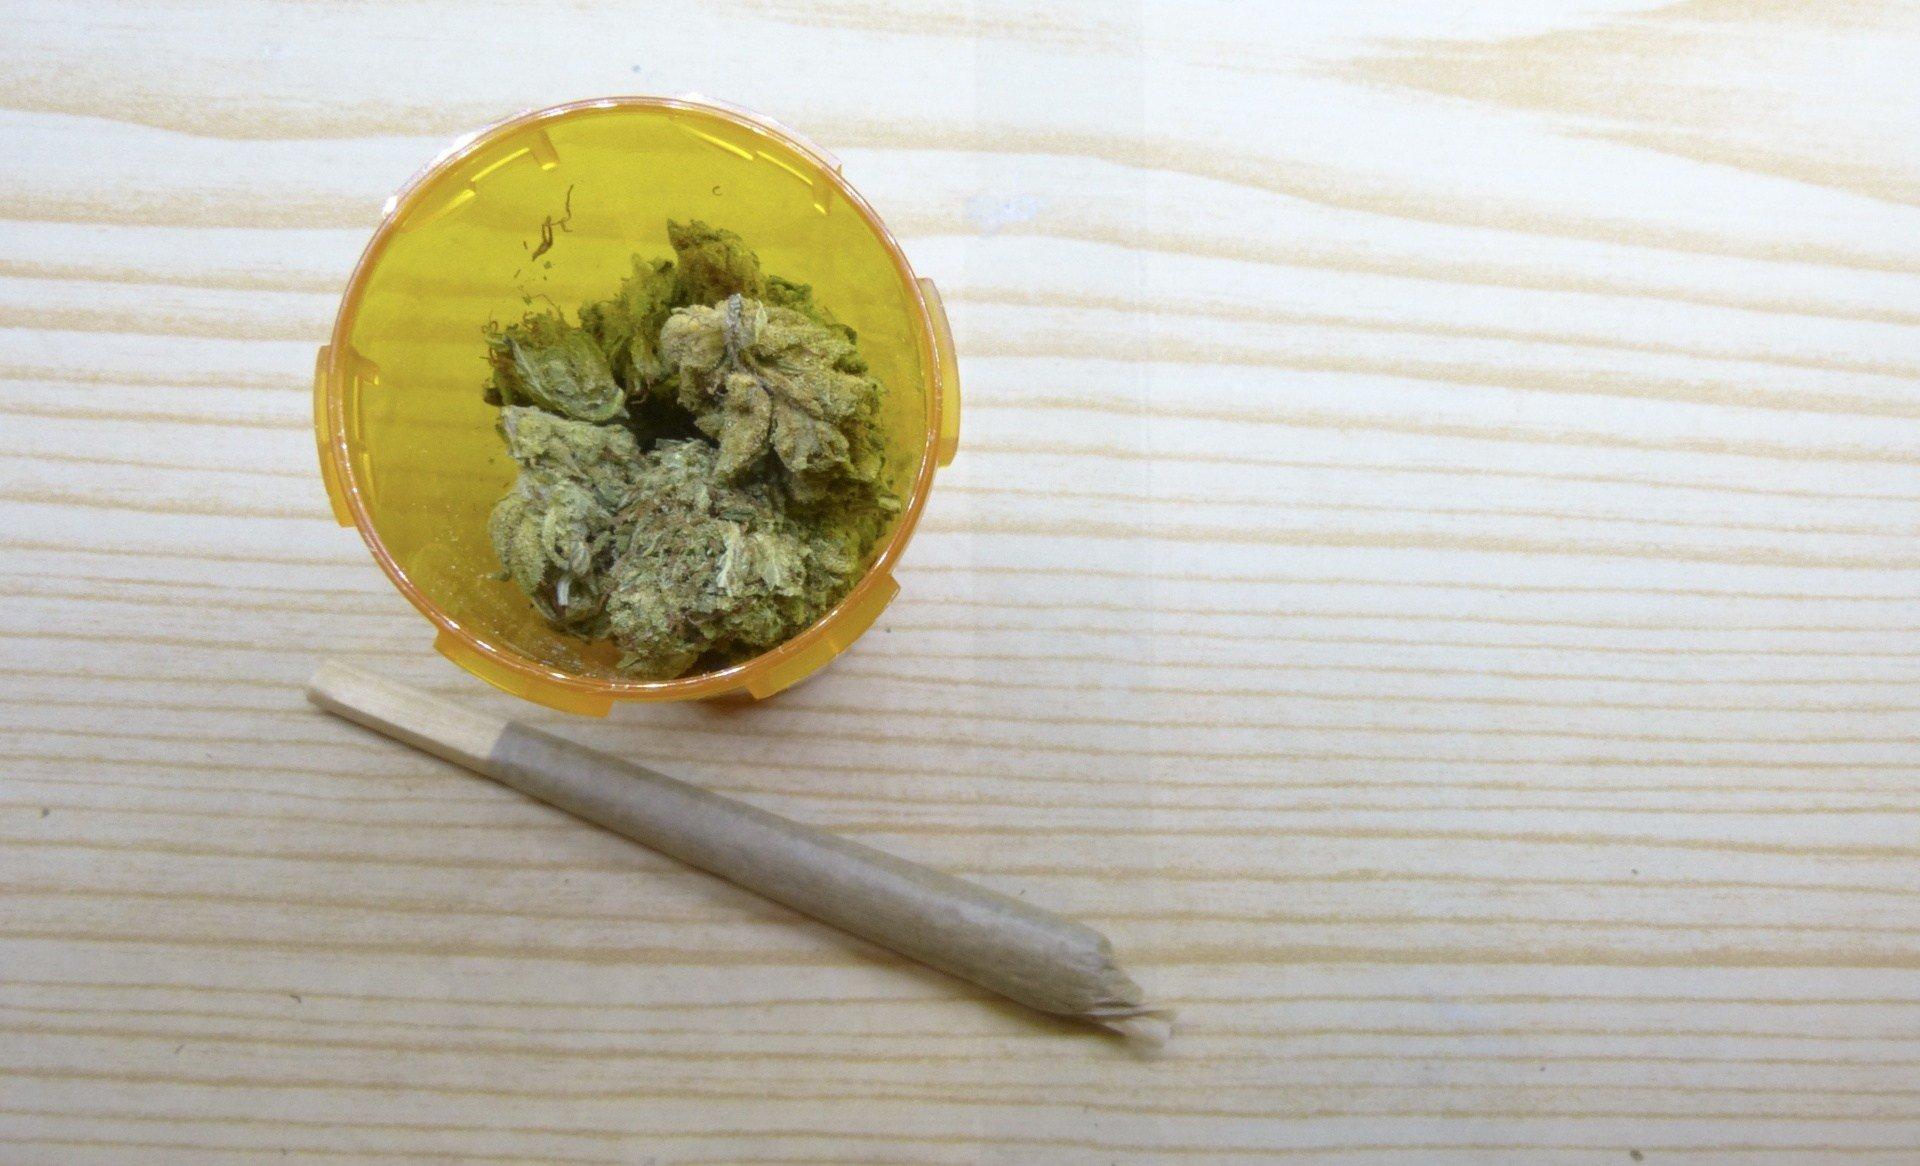 New Jersey Set to Legalize Recreational Marijuana